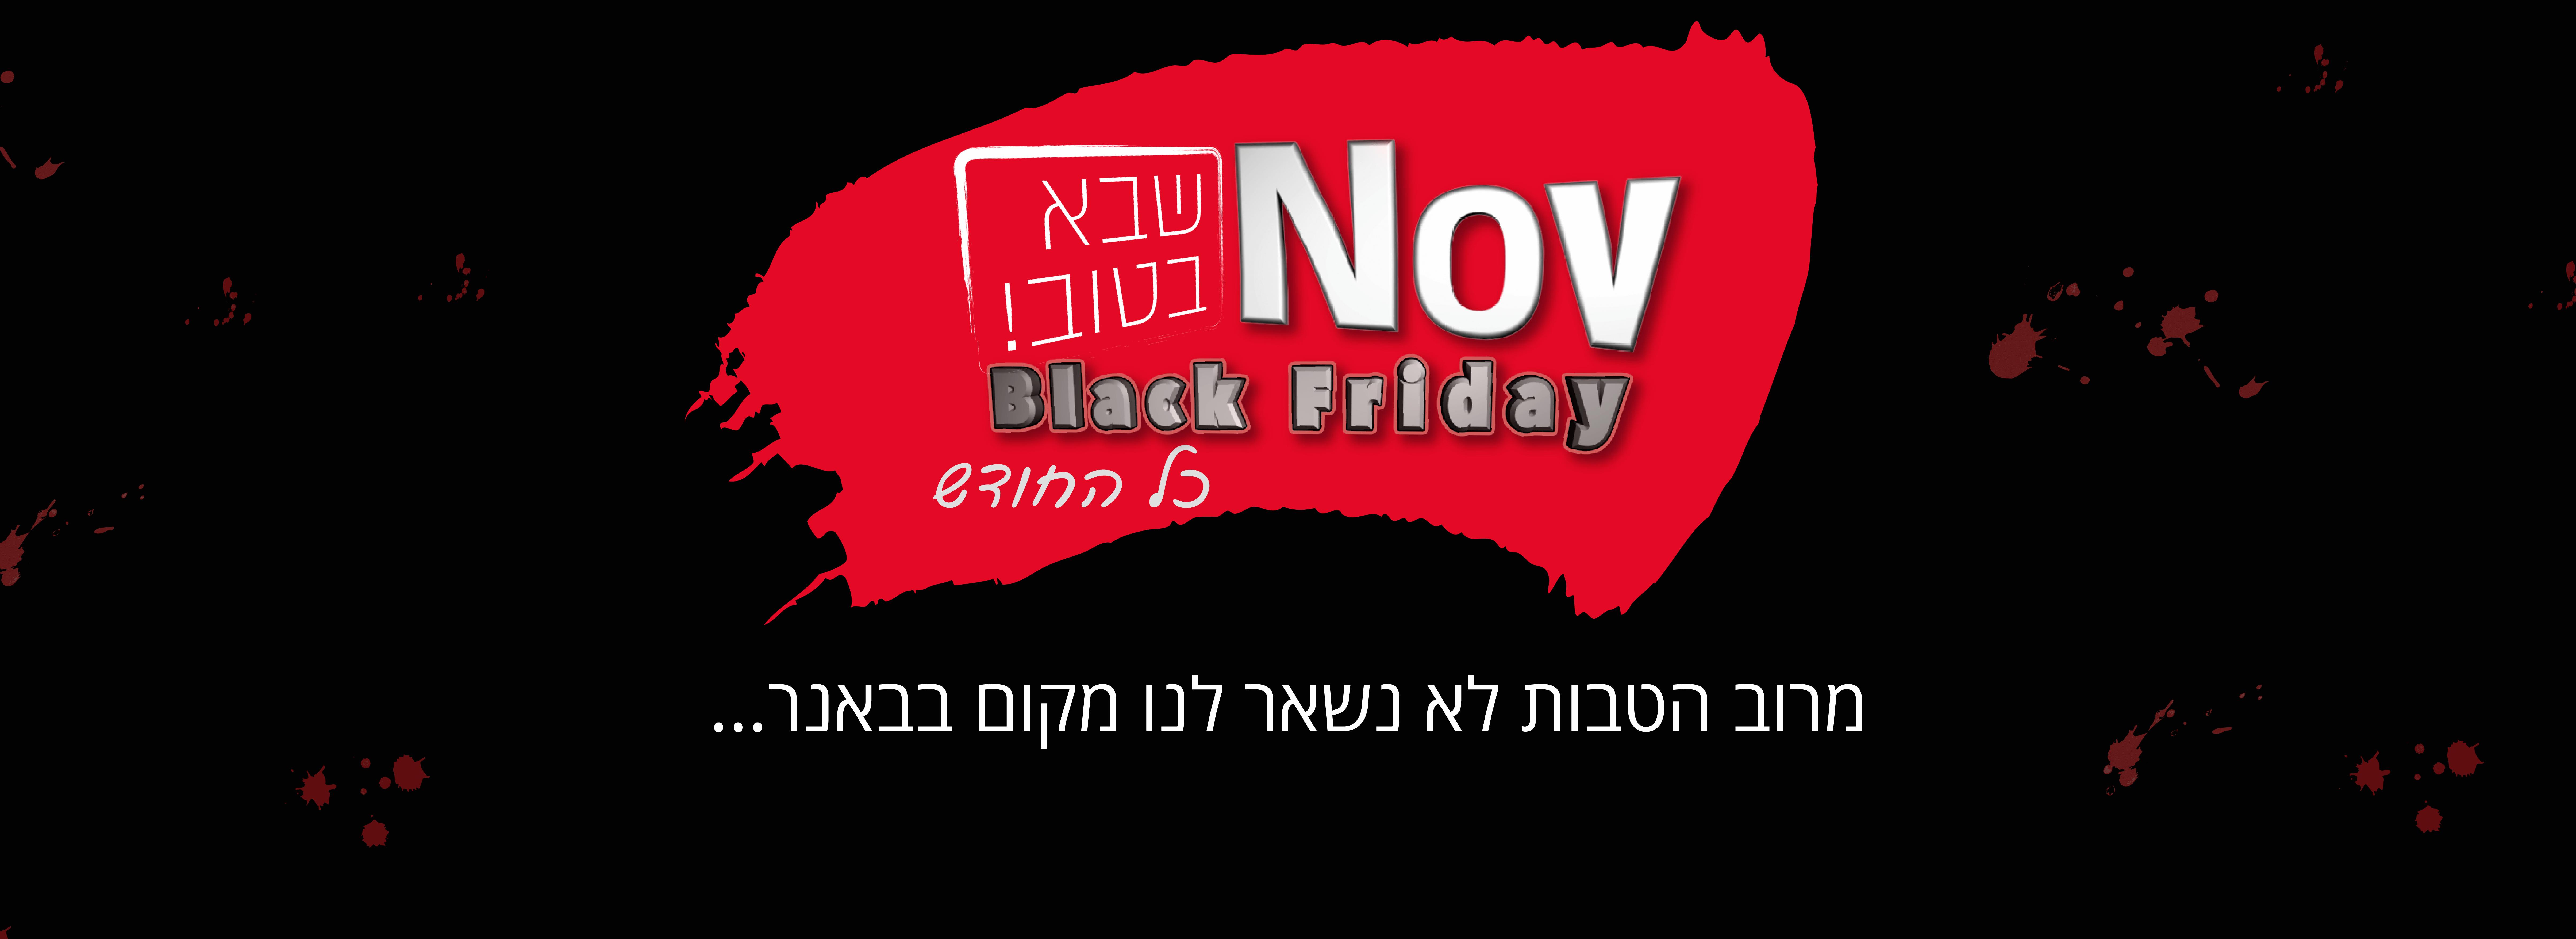 Nov שבא בטוב (Main)